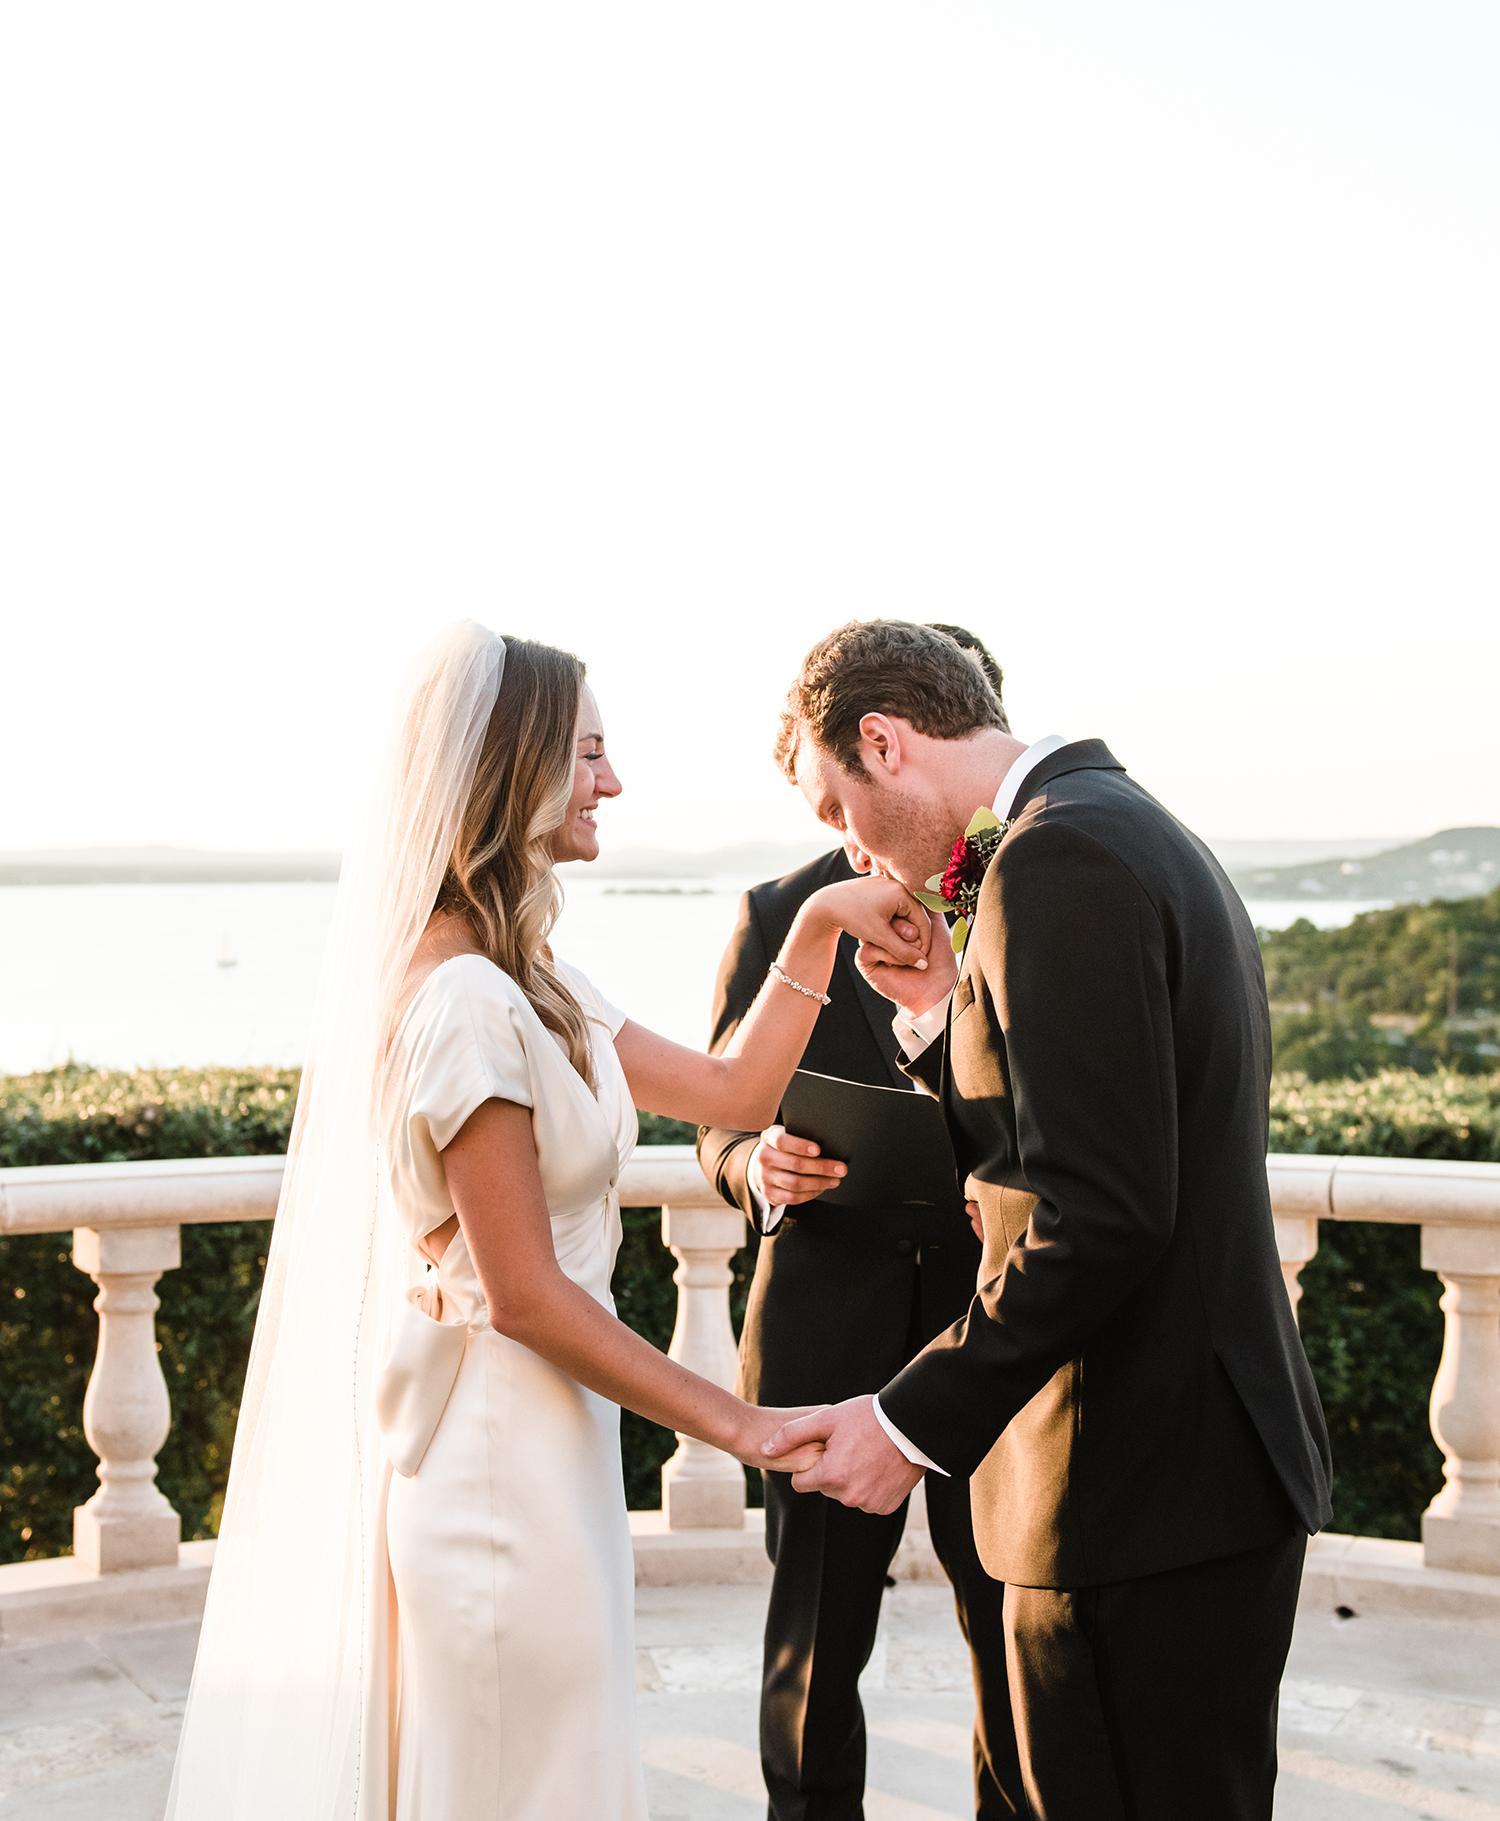 livvyland-blog-olivia-watson-wedding-villa-del-lago-austin-texas-fall-blush-burgundy-classic-romantic-altar-kiss